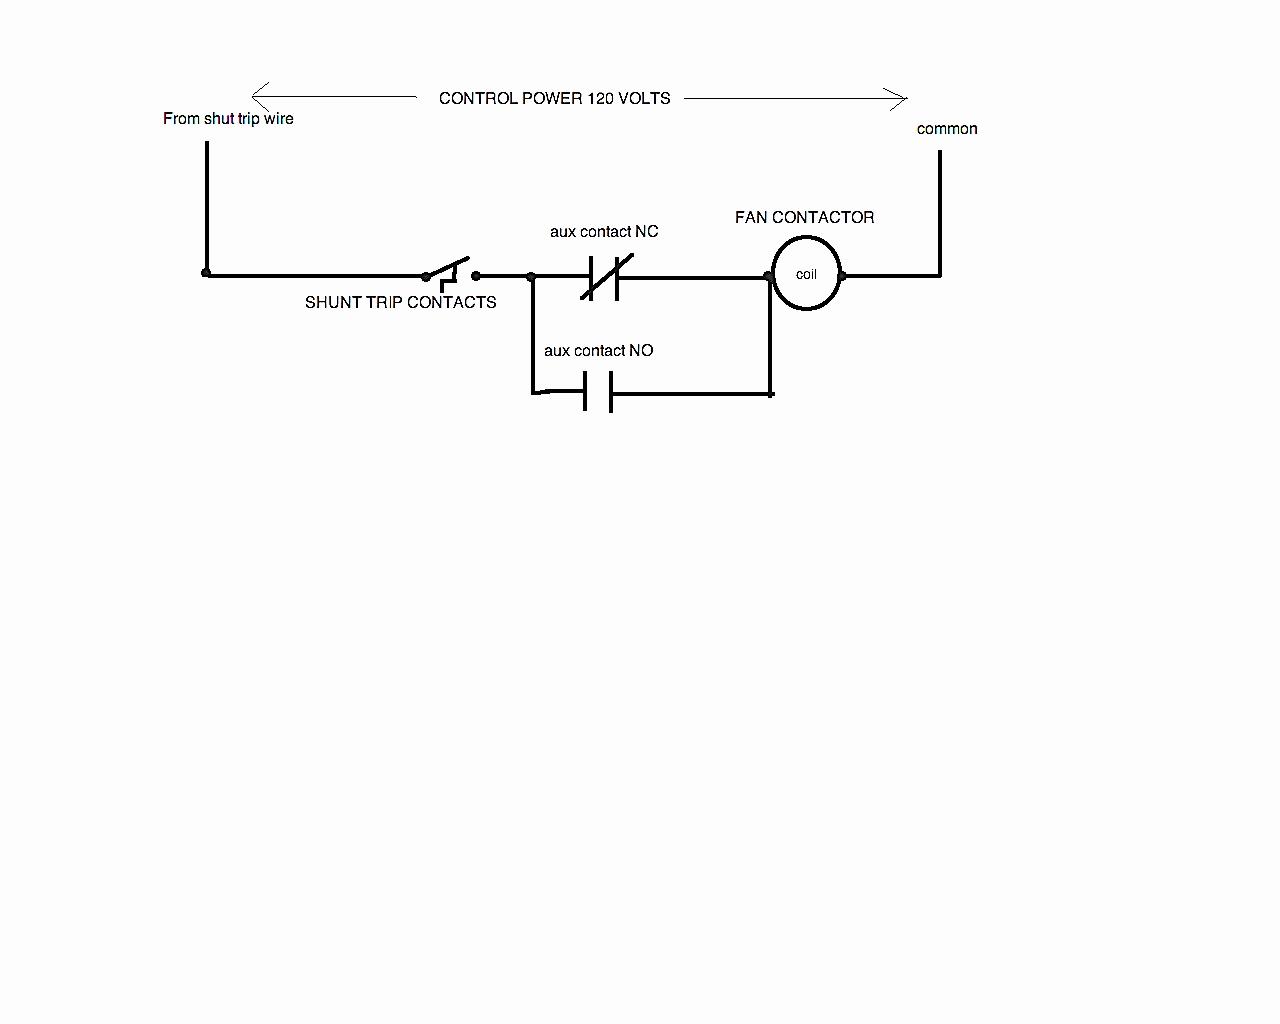 Ansul Shut Down Wiring Diagram | Wiring Diagram - Ansul System Wiring Diagram